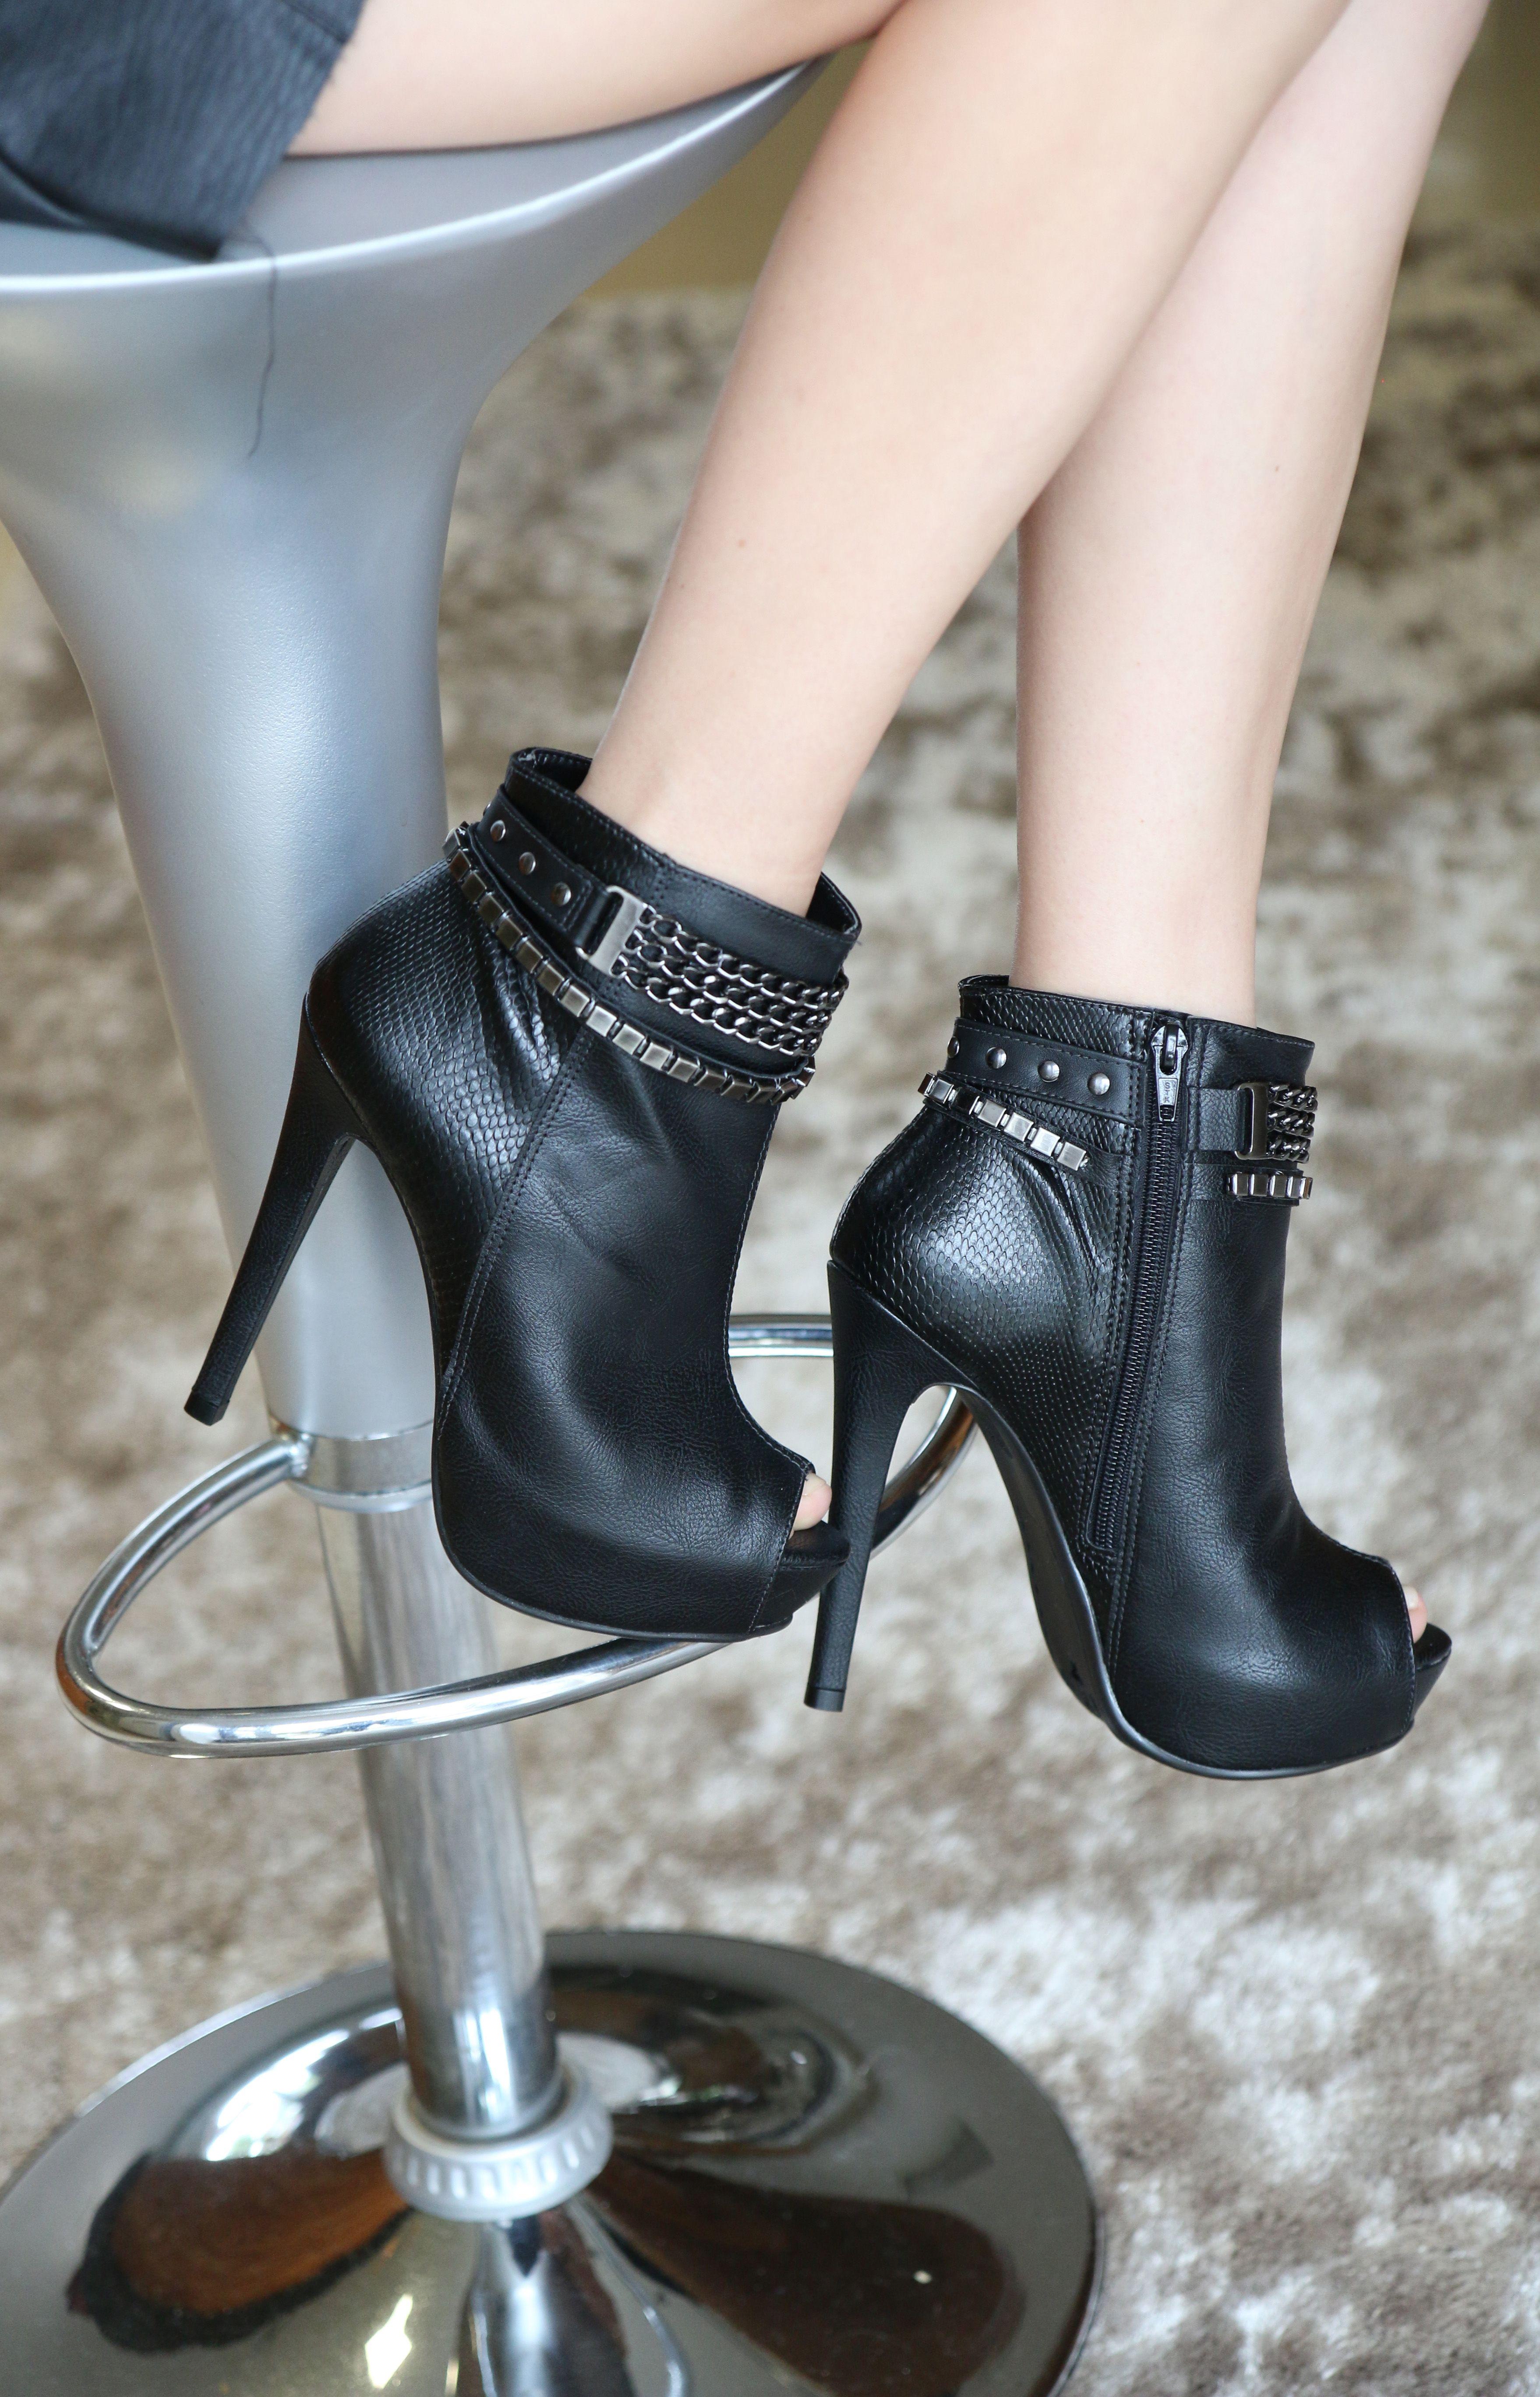 open boots salto alto preto black heels correntes dourado inverno 2015 ref 15. Black Bedroom Furniture Sets. Home Design Ideas